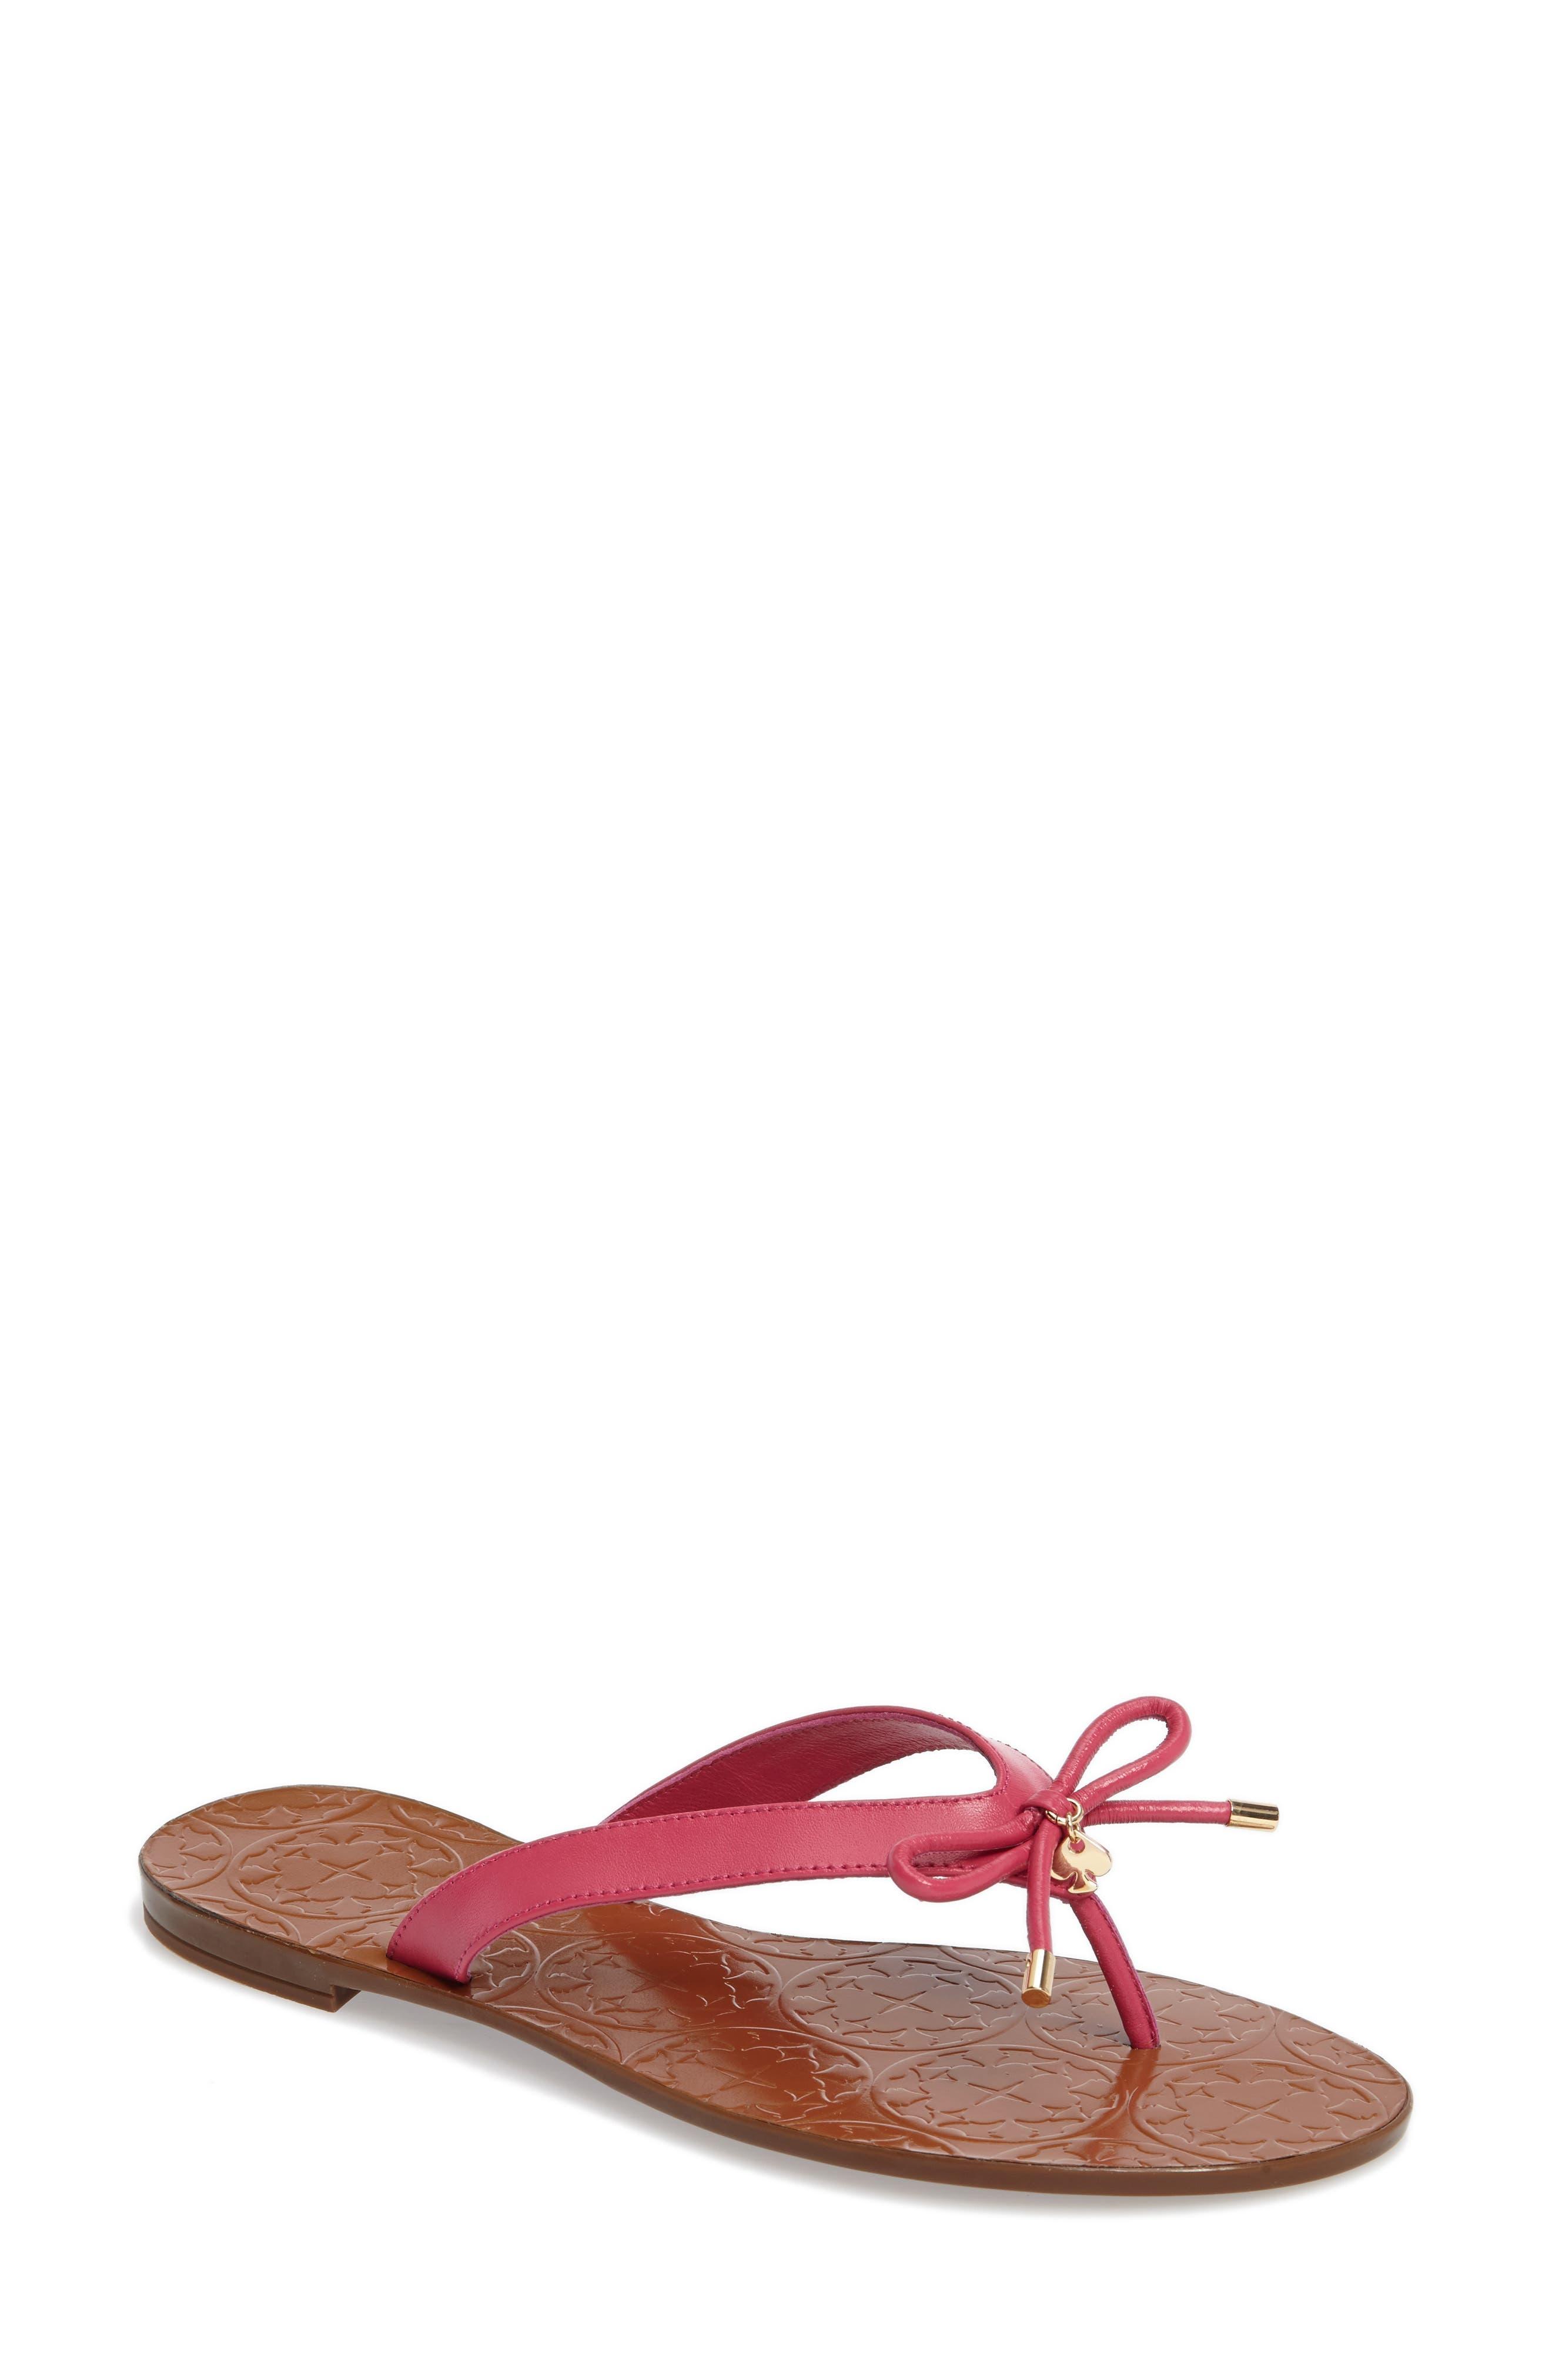 kate spade new york charles flip flop (Women)